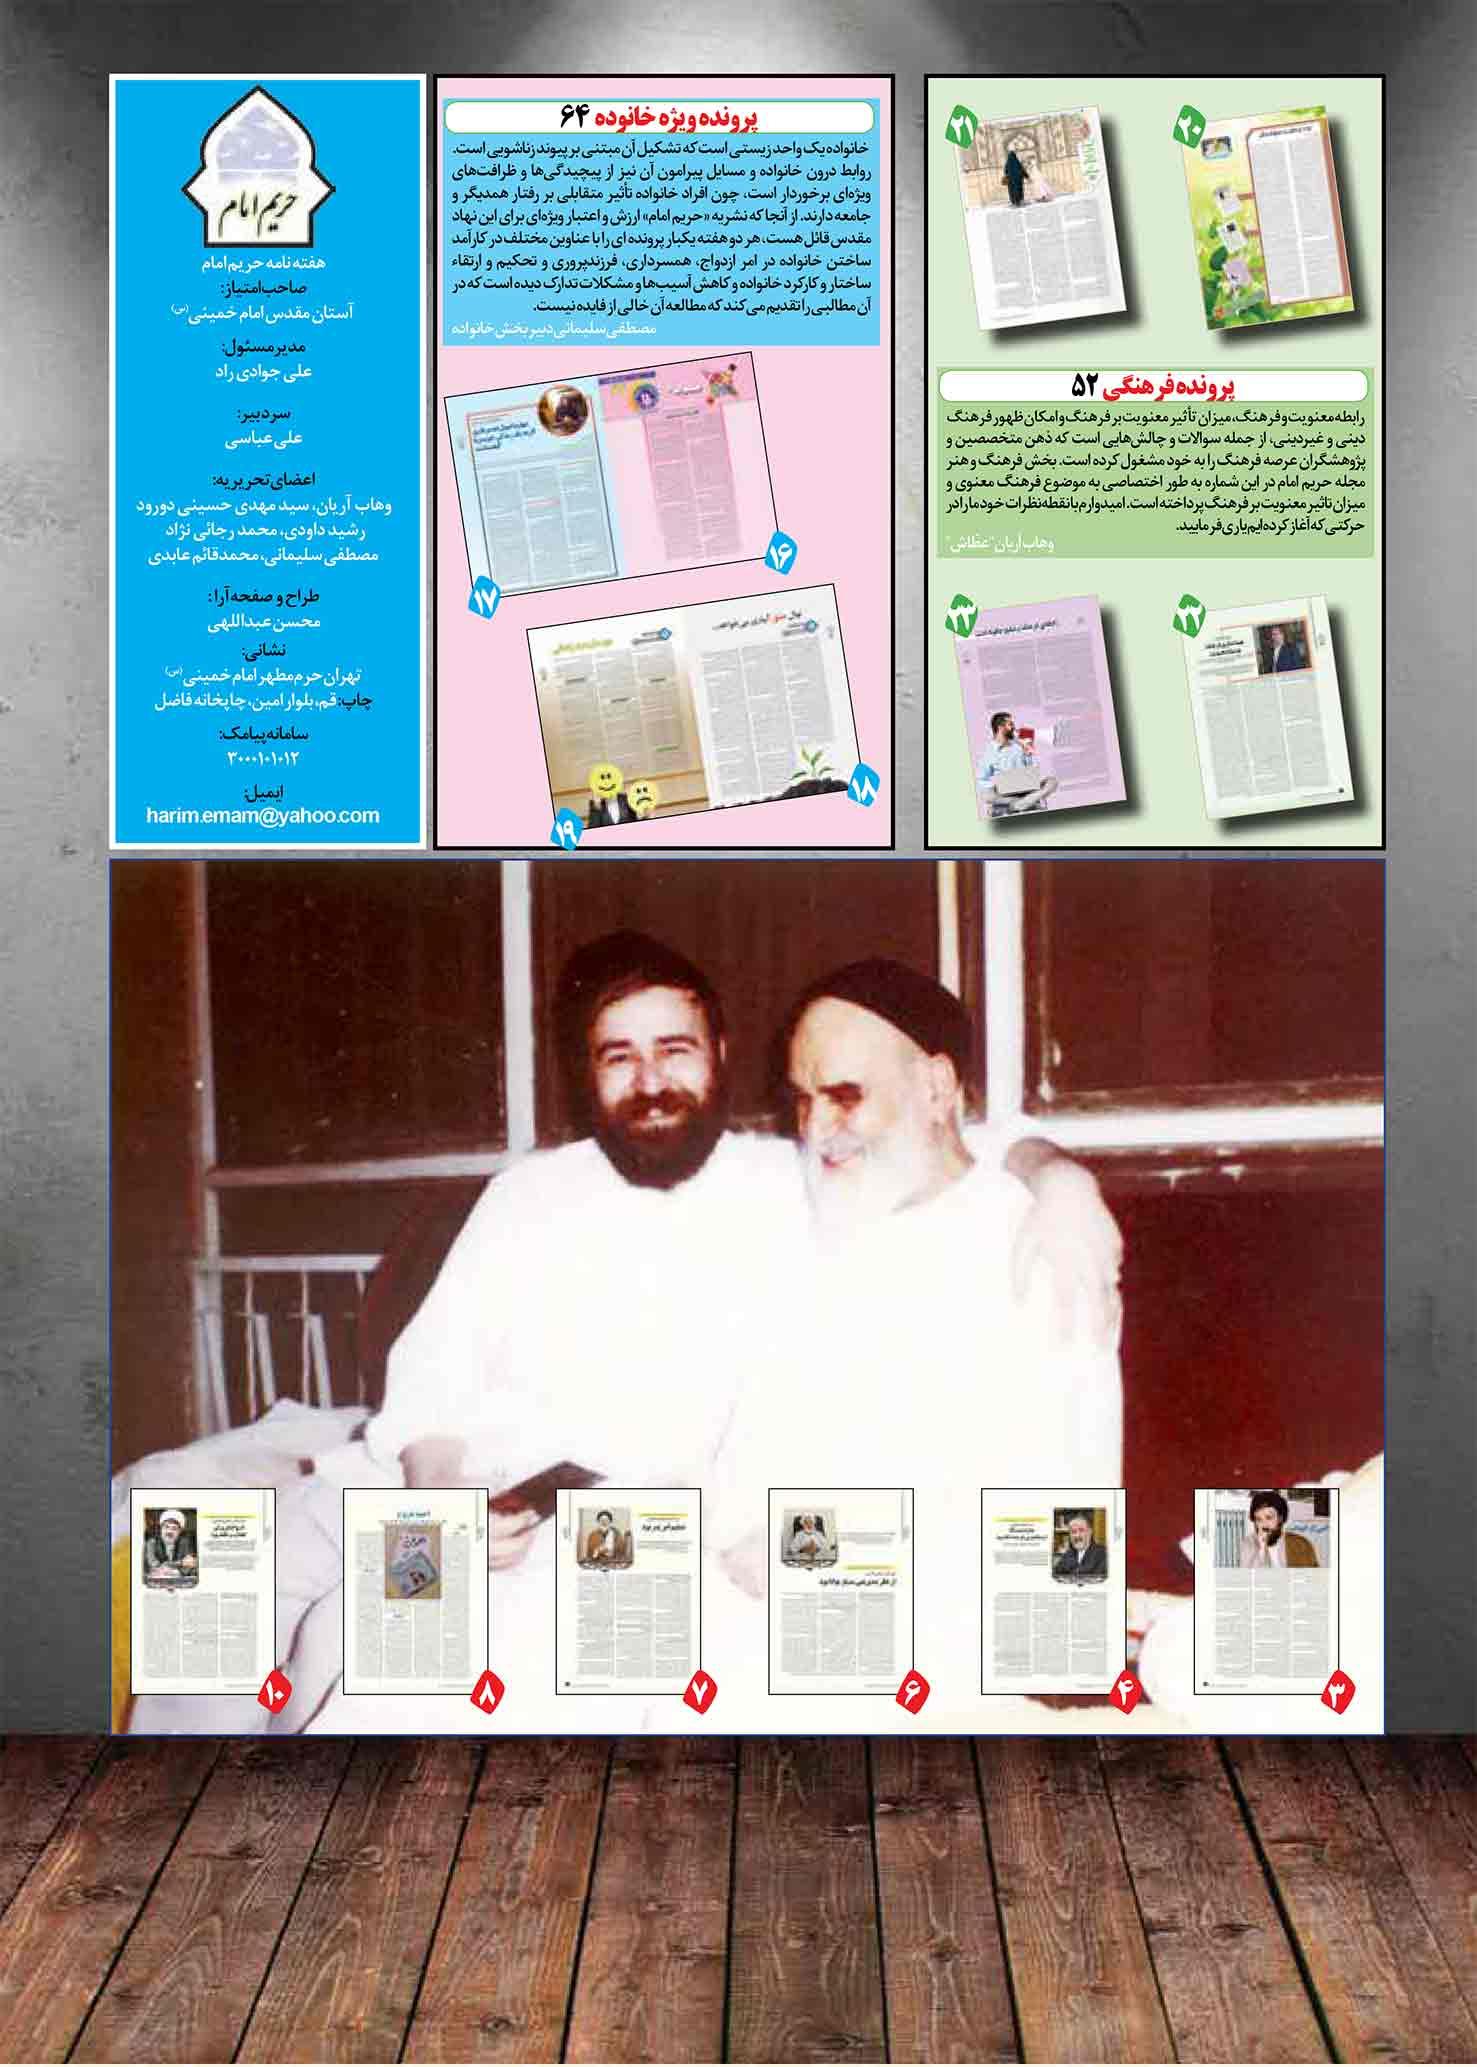 D:\khalojini\Drive I\کارهای پرتال\97\حریم امام\361\New folder\@harim_emam361-2.jpg